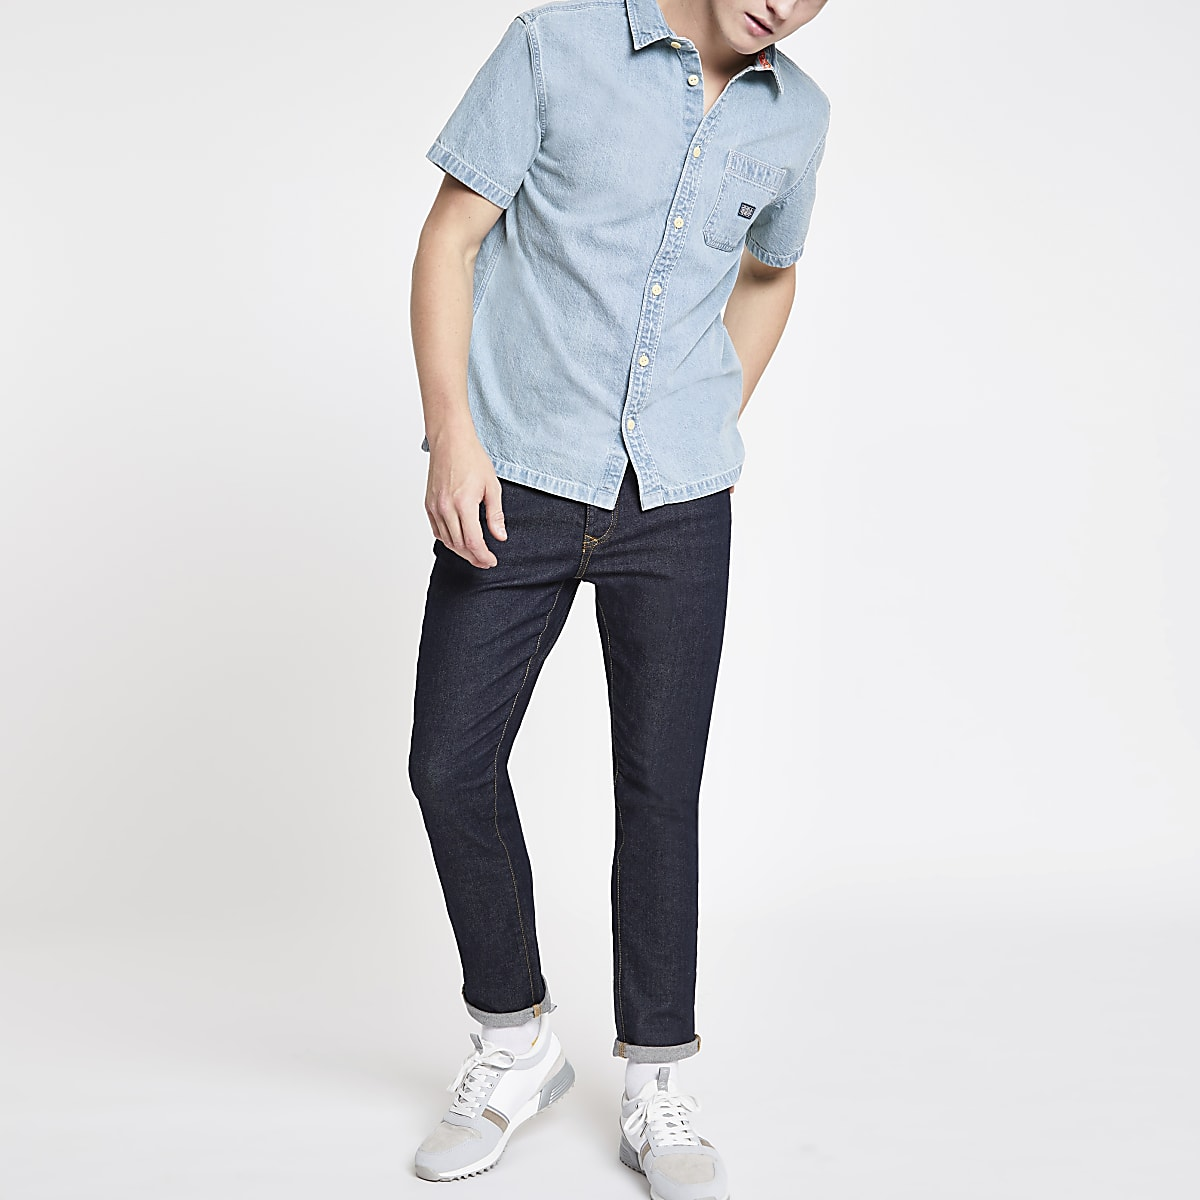 Superdry light blue denim short sleeve shirt